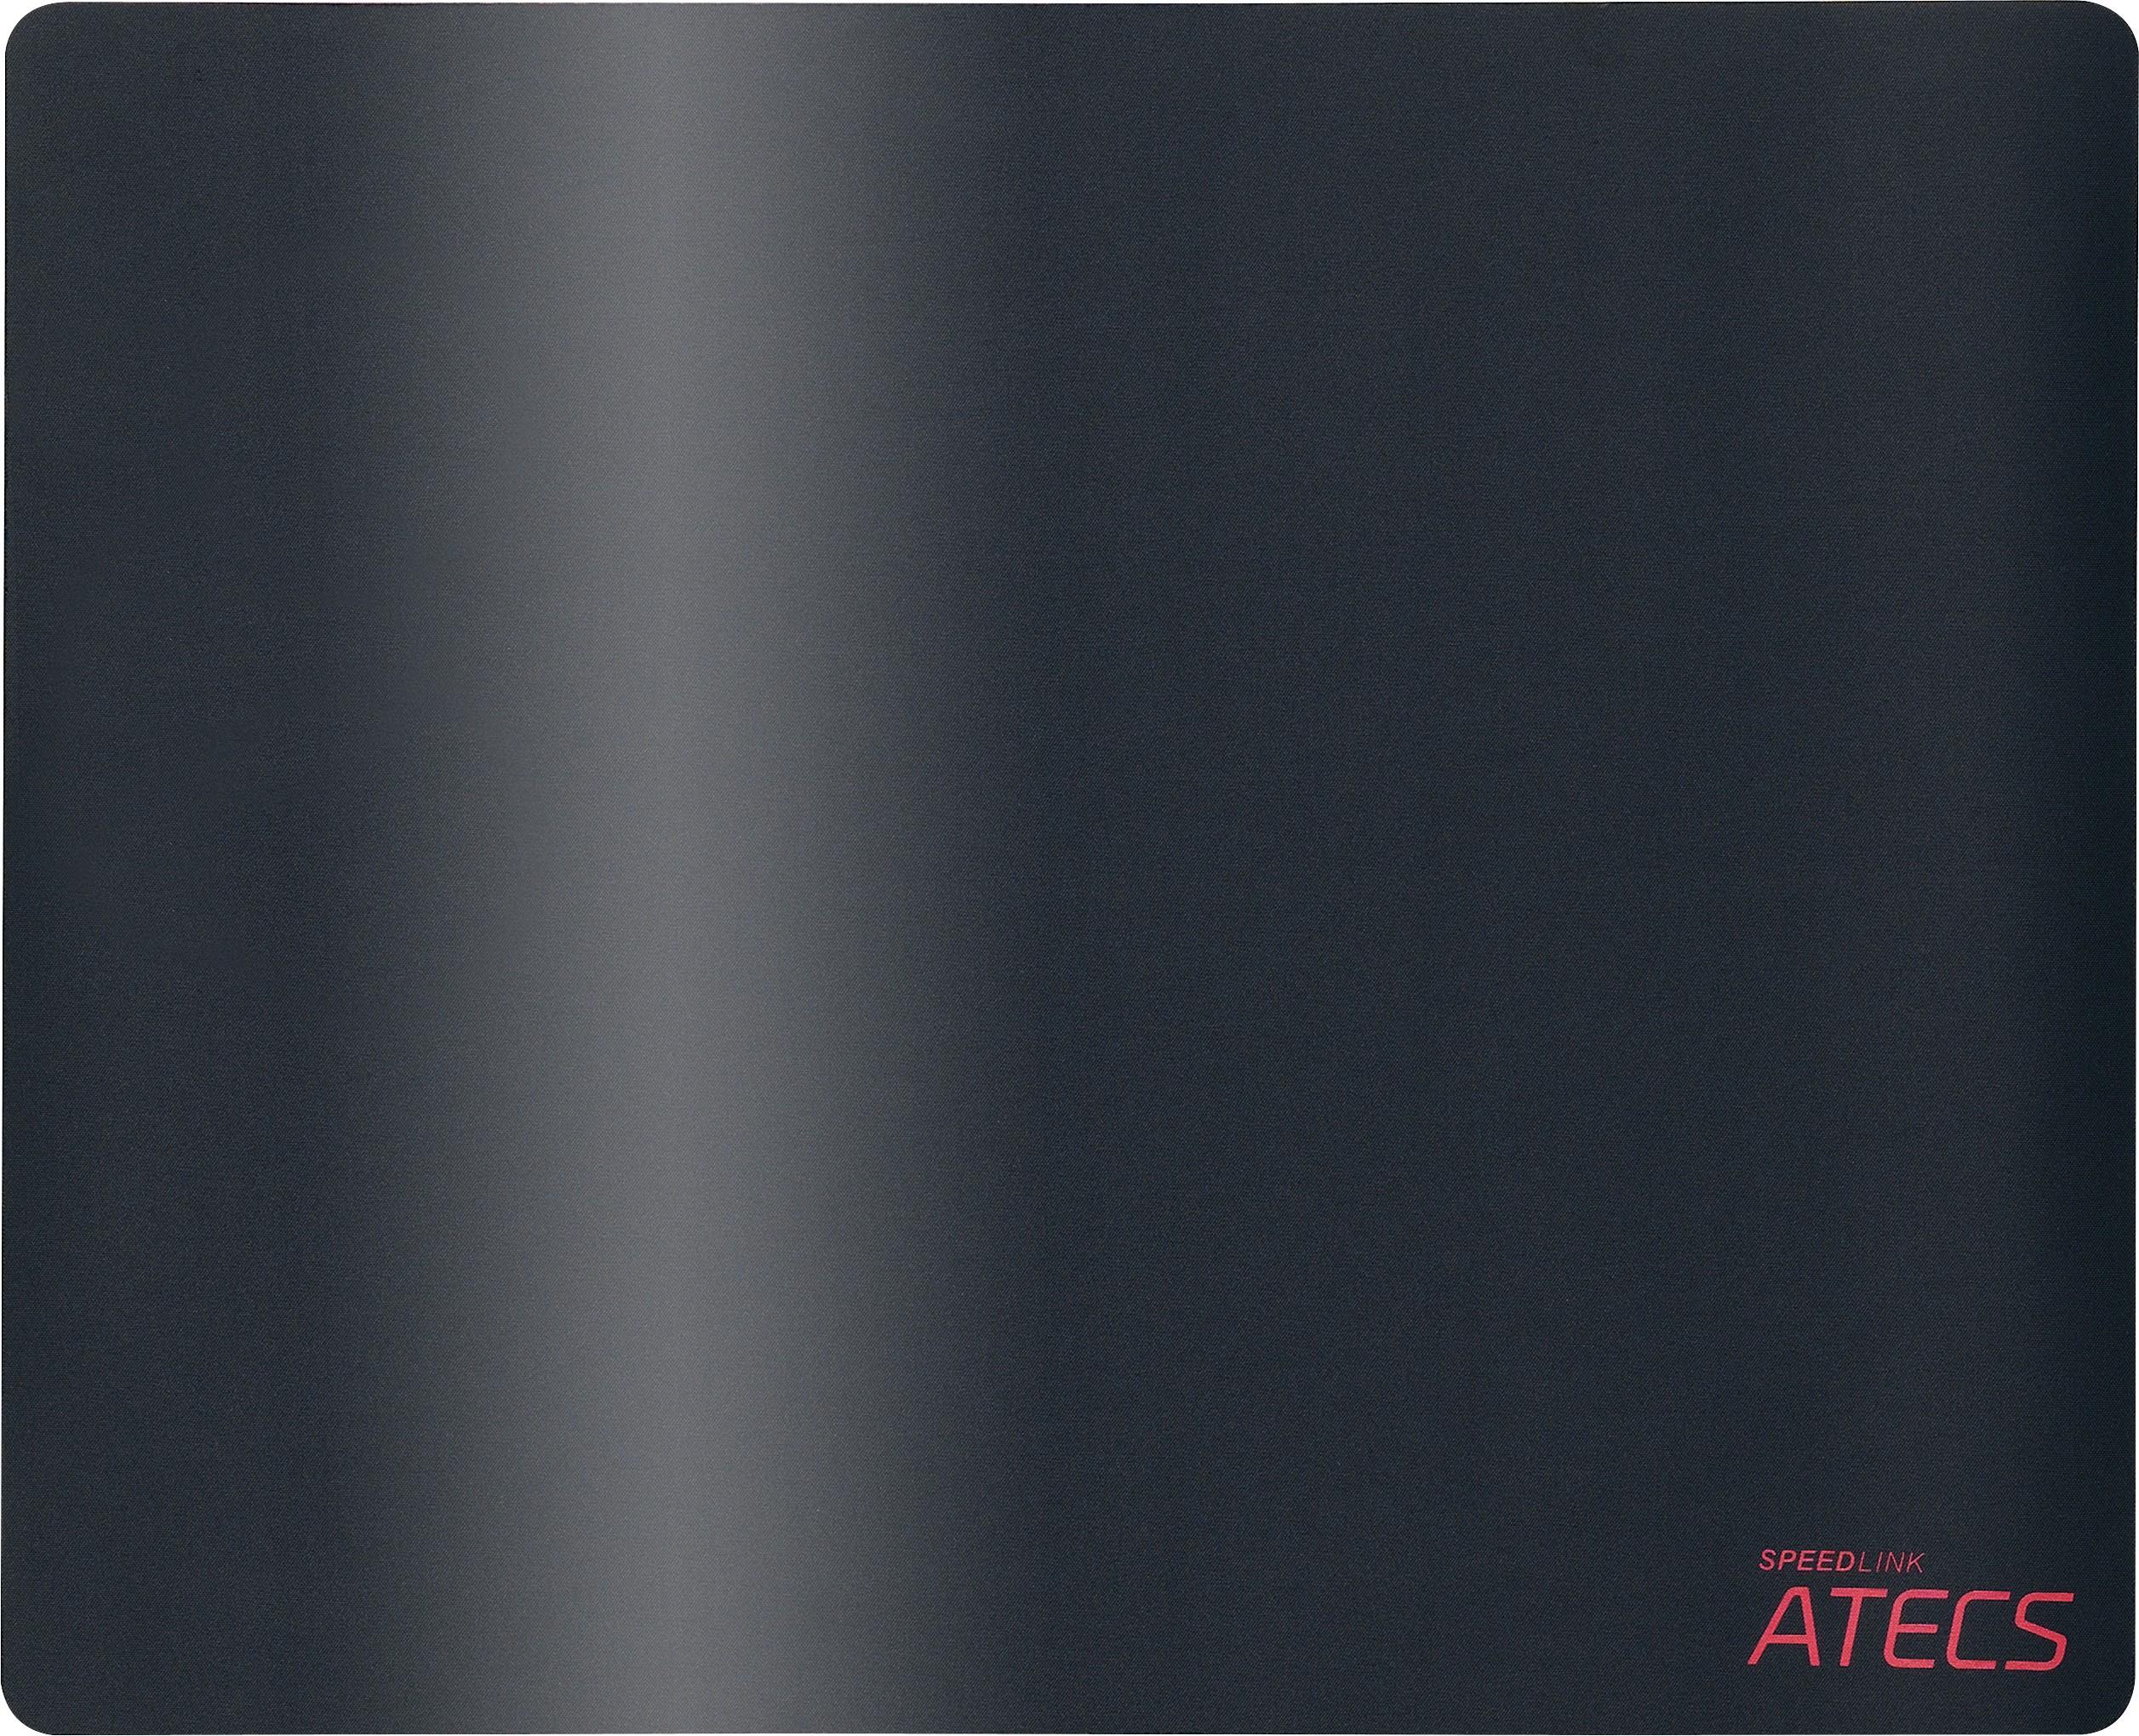 Speedlink hiirematt Atecs L (SL-620101-L)